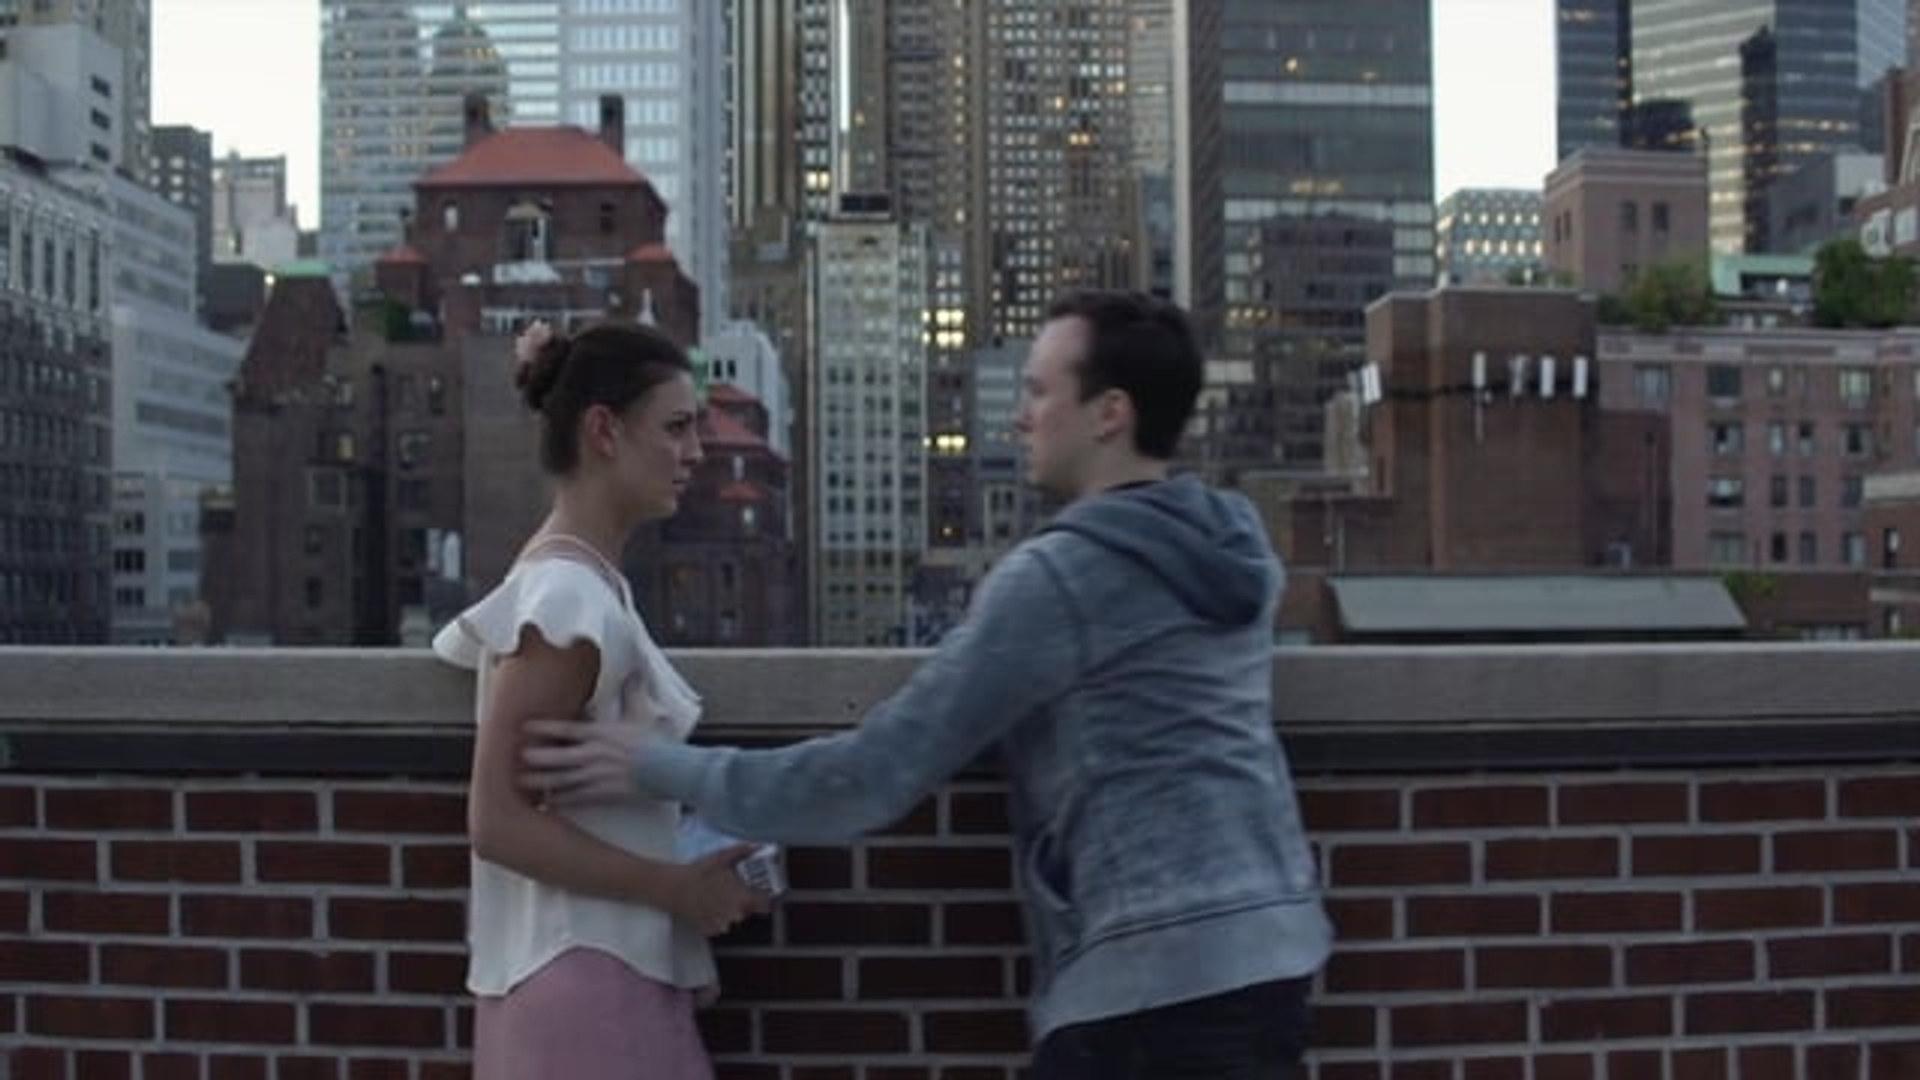 Romantic Reunion of Ukrainian Girl and American Boy